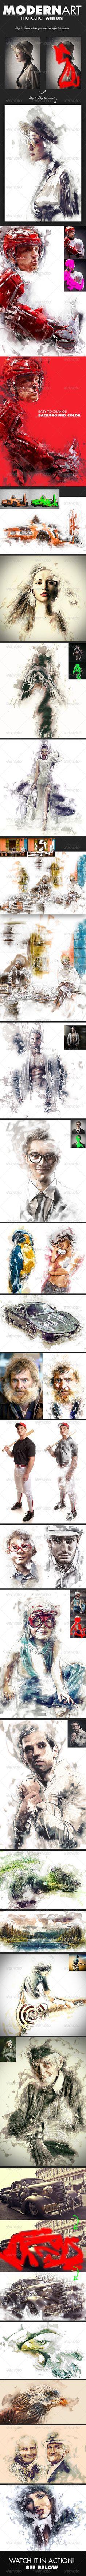 ModernArt Photoshop Action (premium) http://graphicriver.net/item/modernart-photoshop-action/8163995?ref=Artlandis